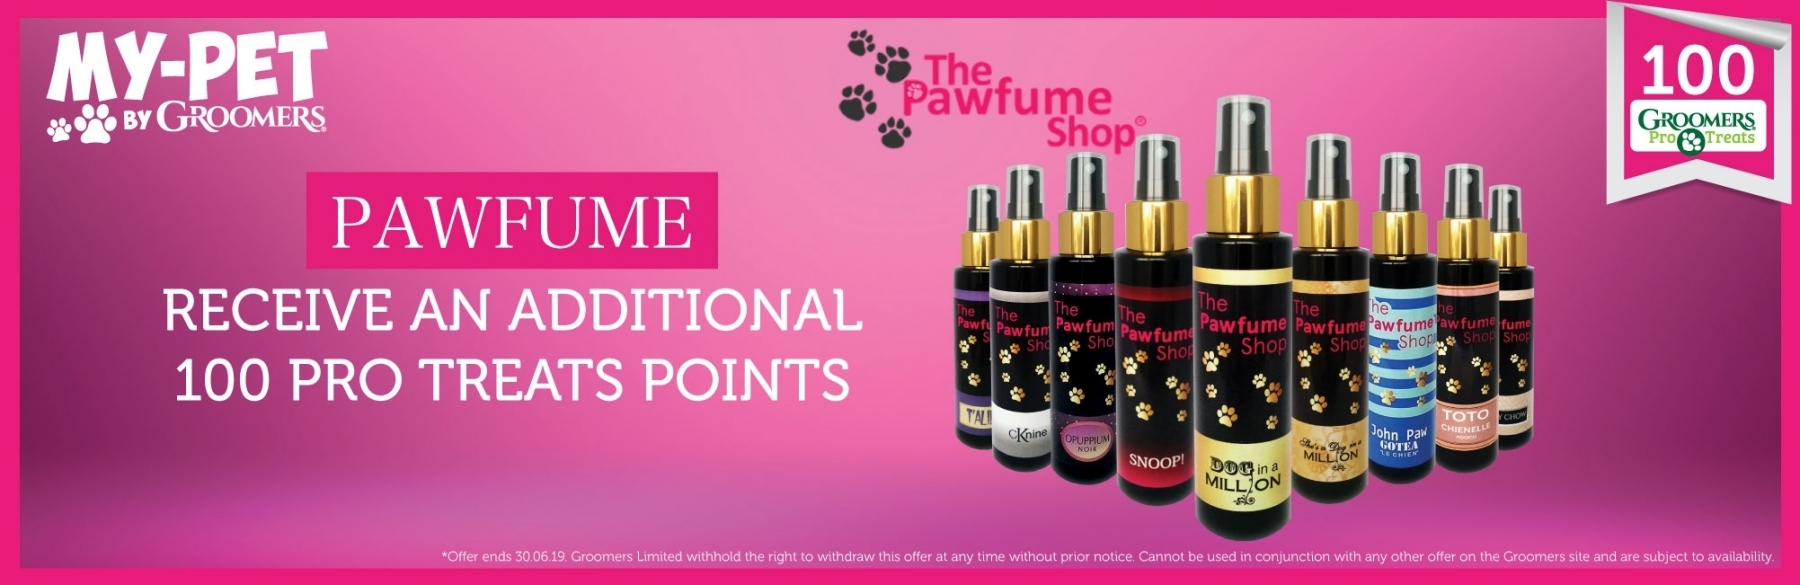 100 Bonus Pro Treat Points When You Buy A Pawfume